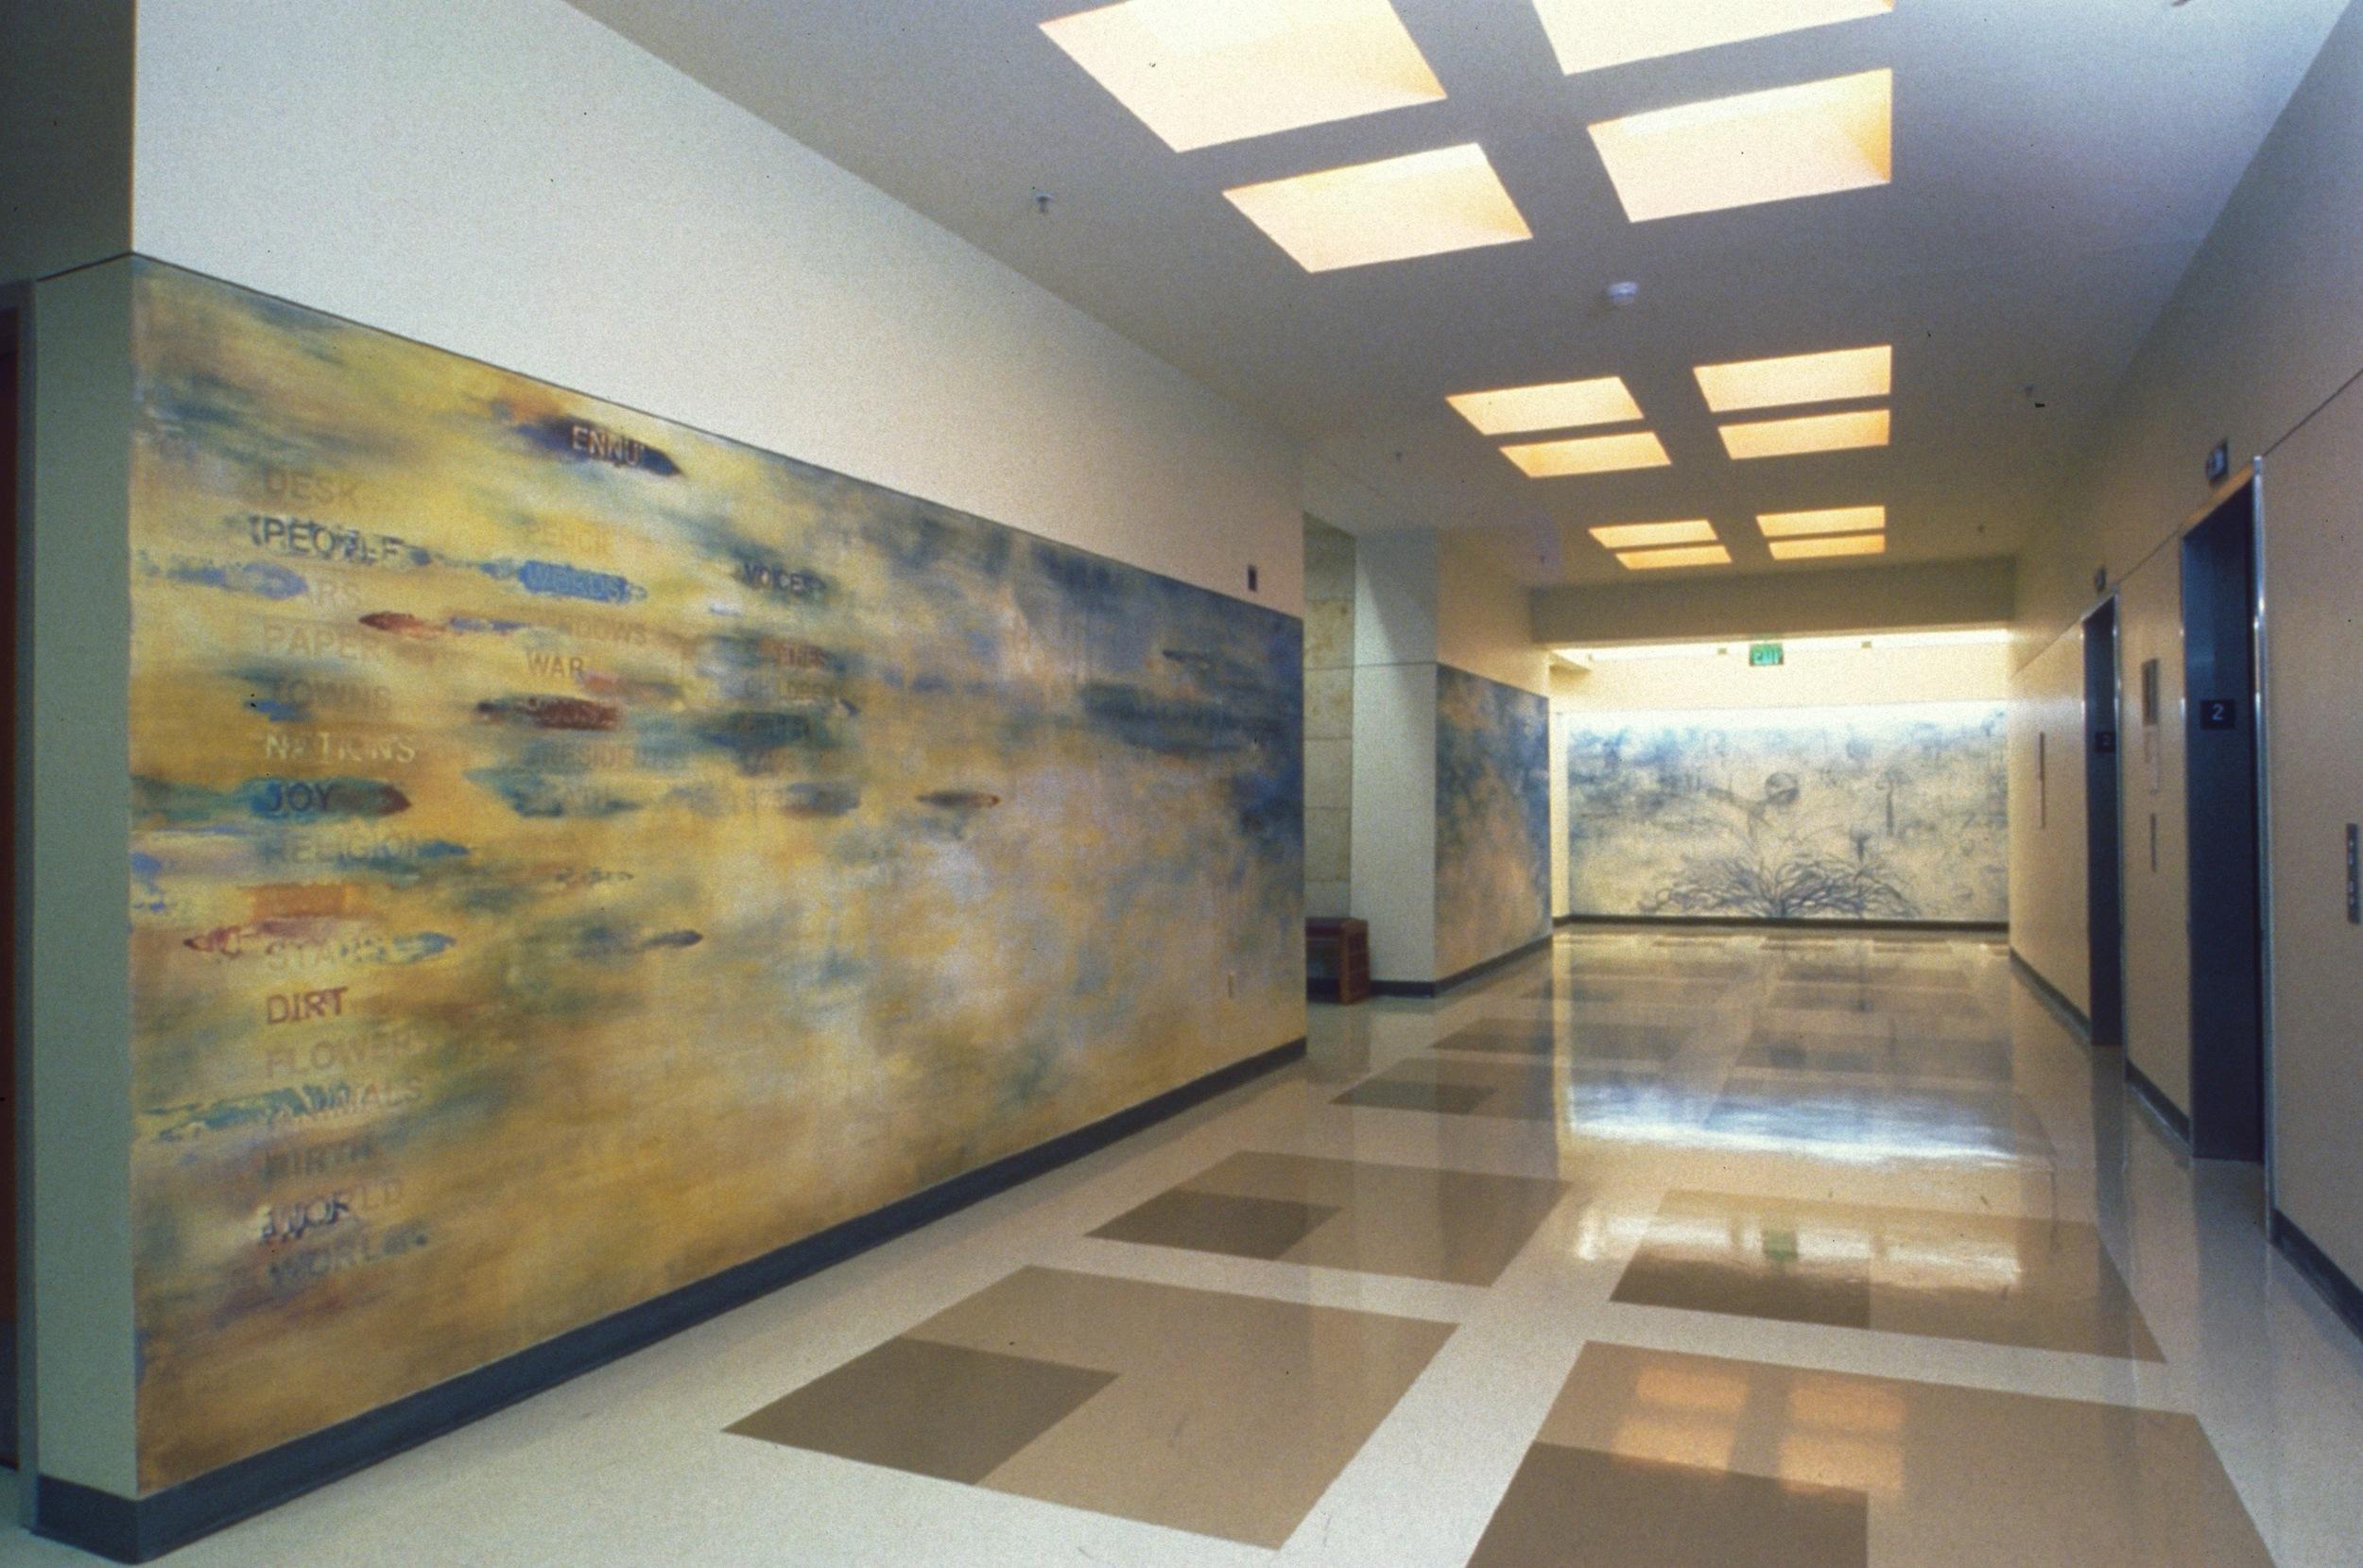 recuerdo (after Tomas Rivera)  University of Texas, San Antonio  Installation Overview  2002